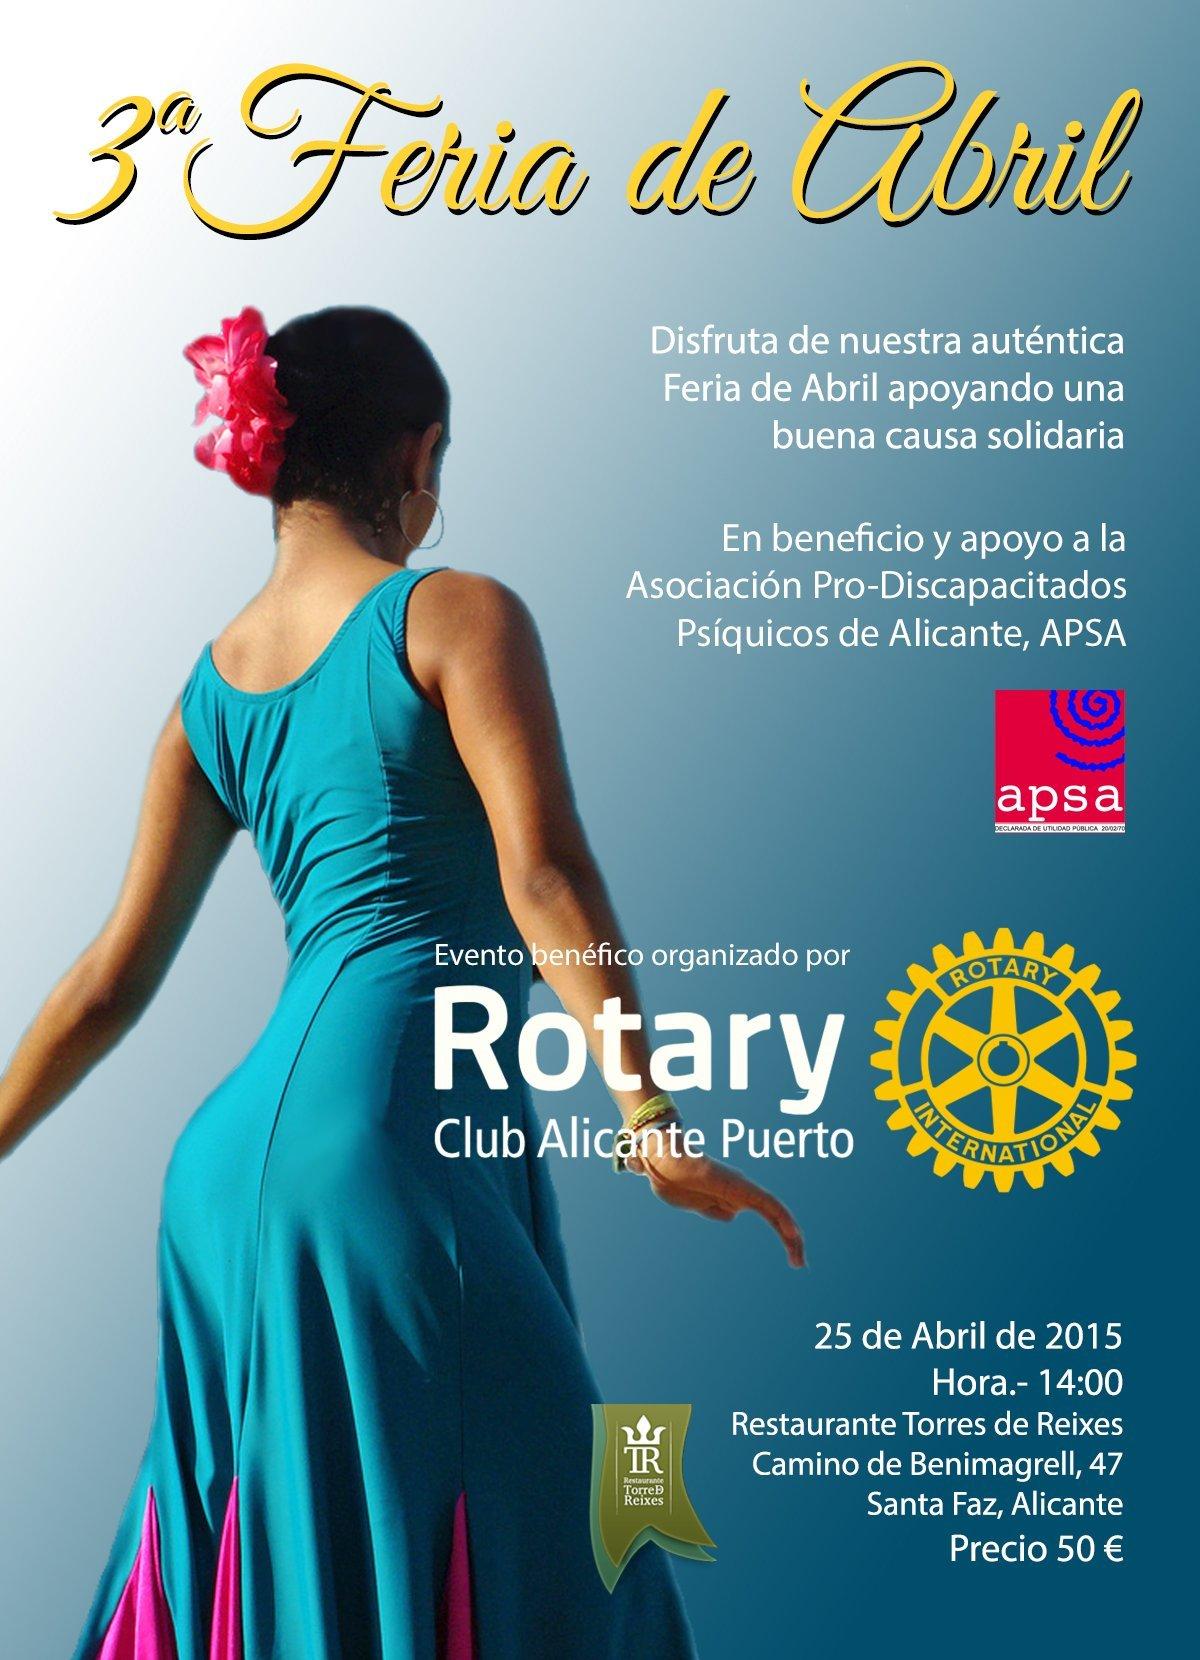 Feria de Abril 2015 - Rotary Club Alicante Puerto